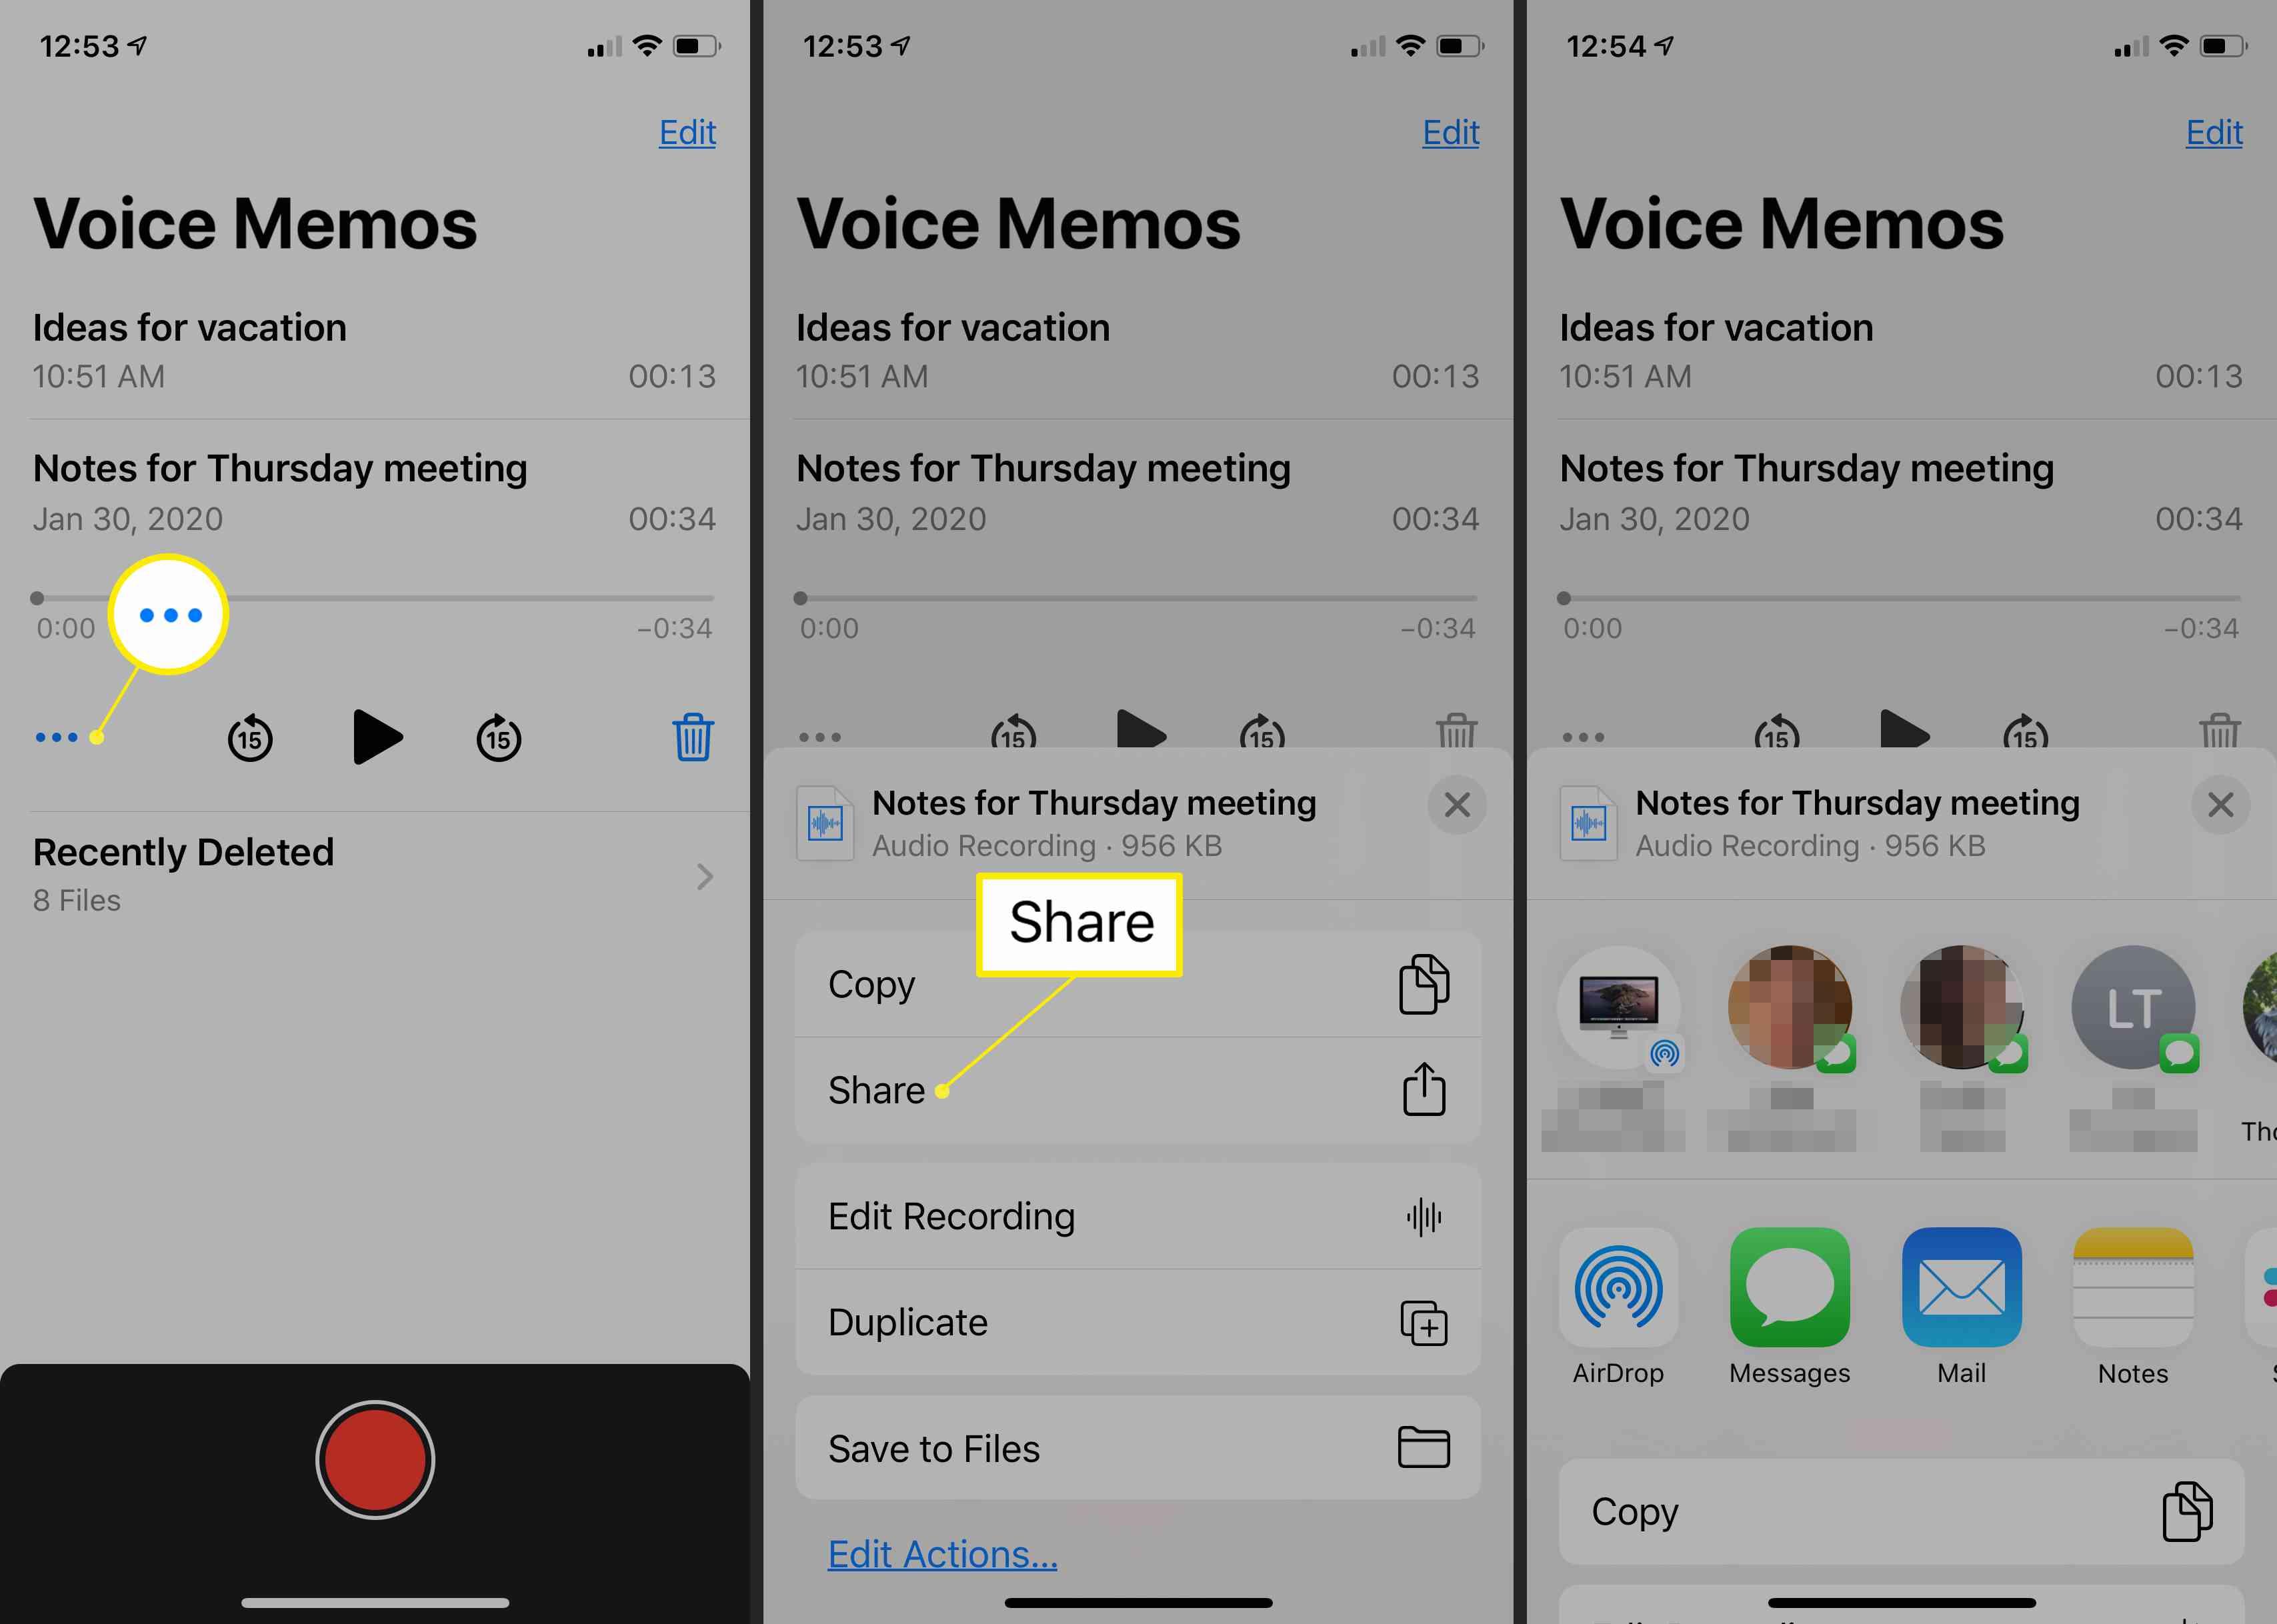 Voice Memos app sharing options